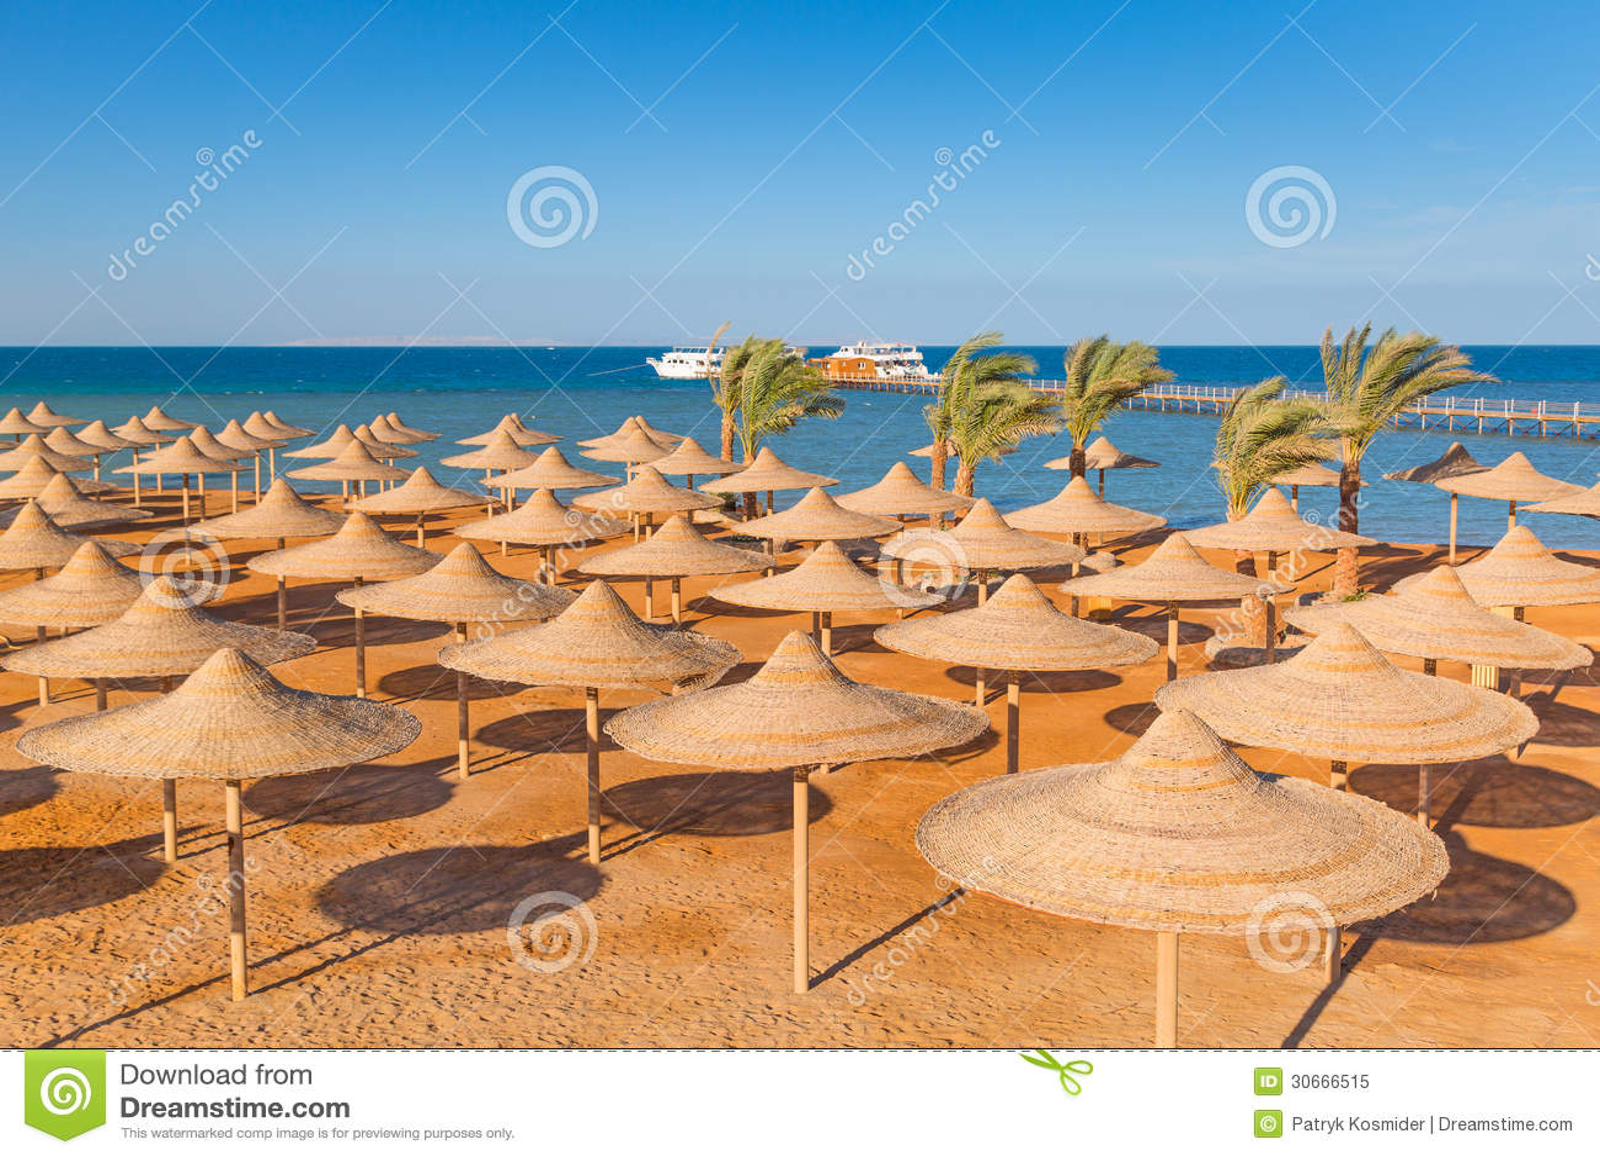 Egyptian parasols on the beach